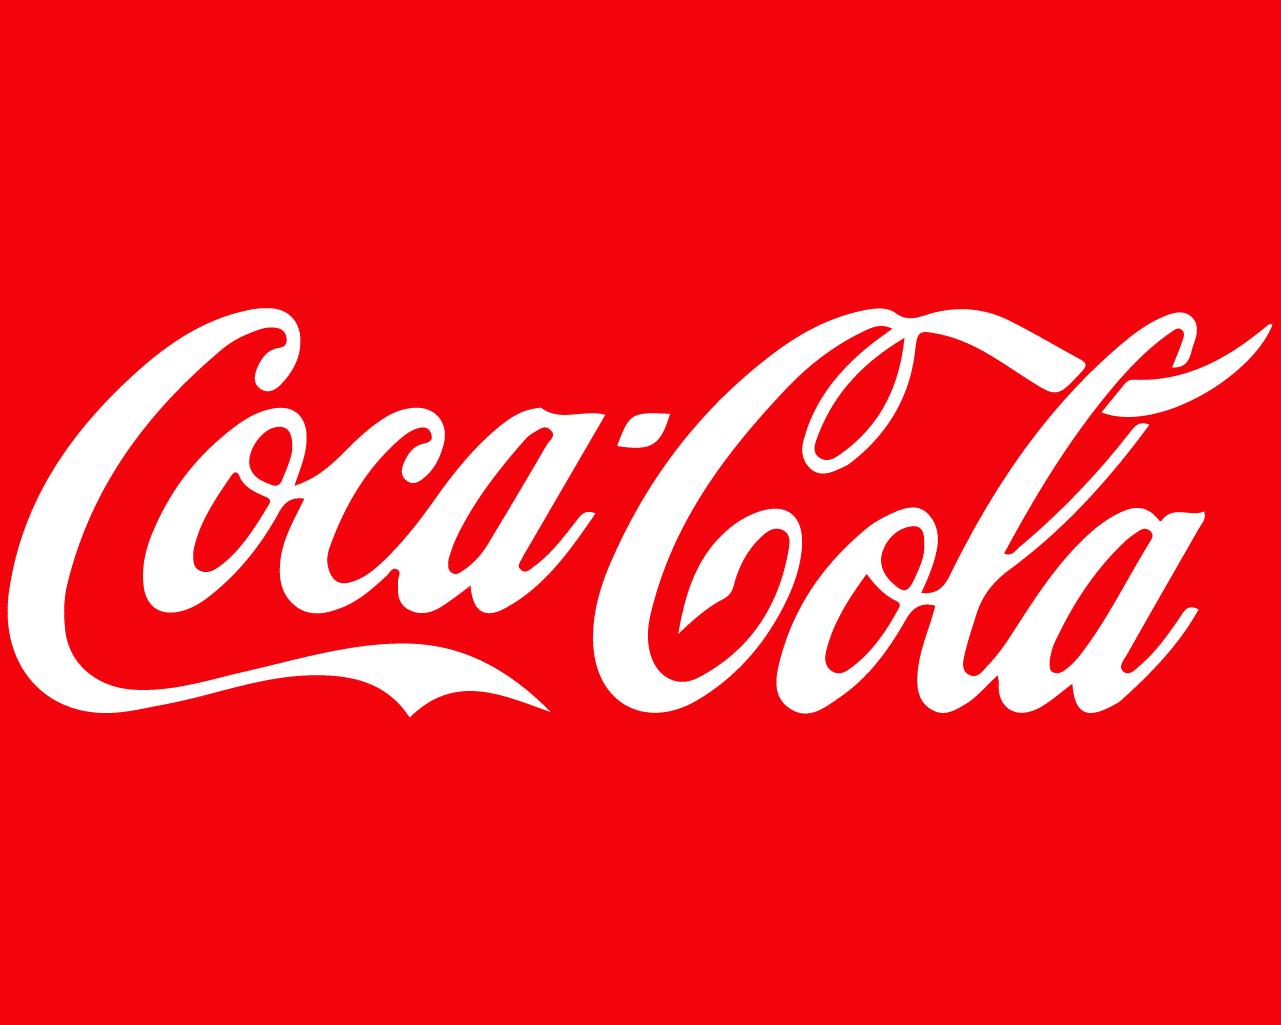 brand logoArtboard 1 copy 10